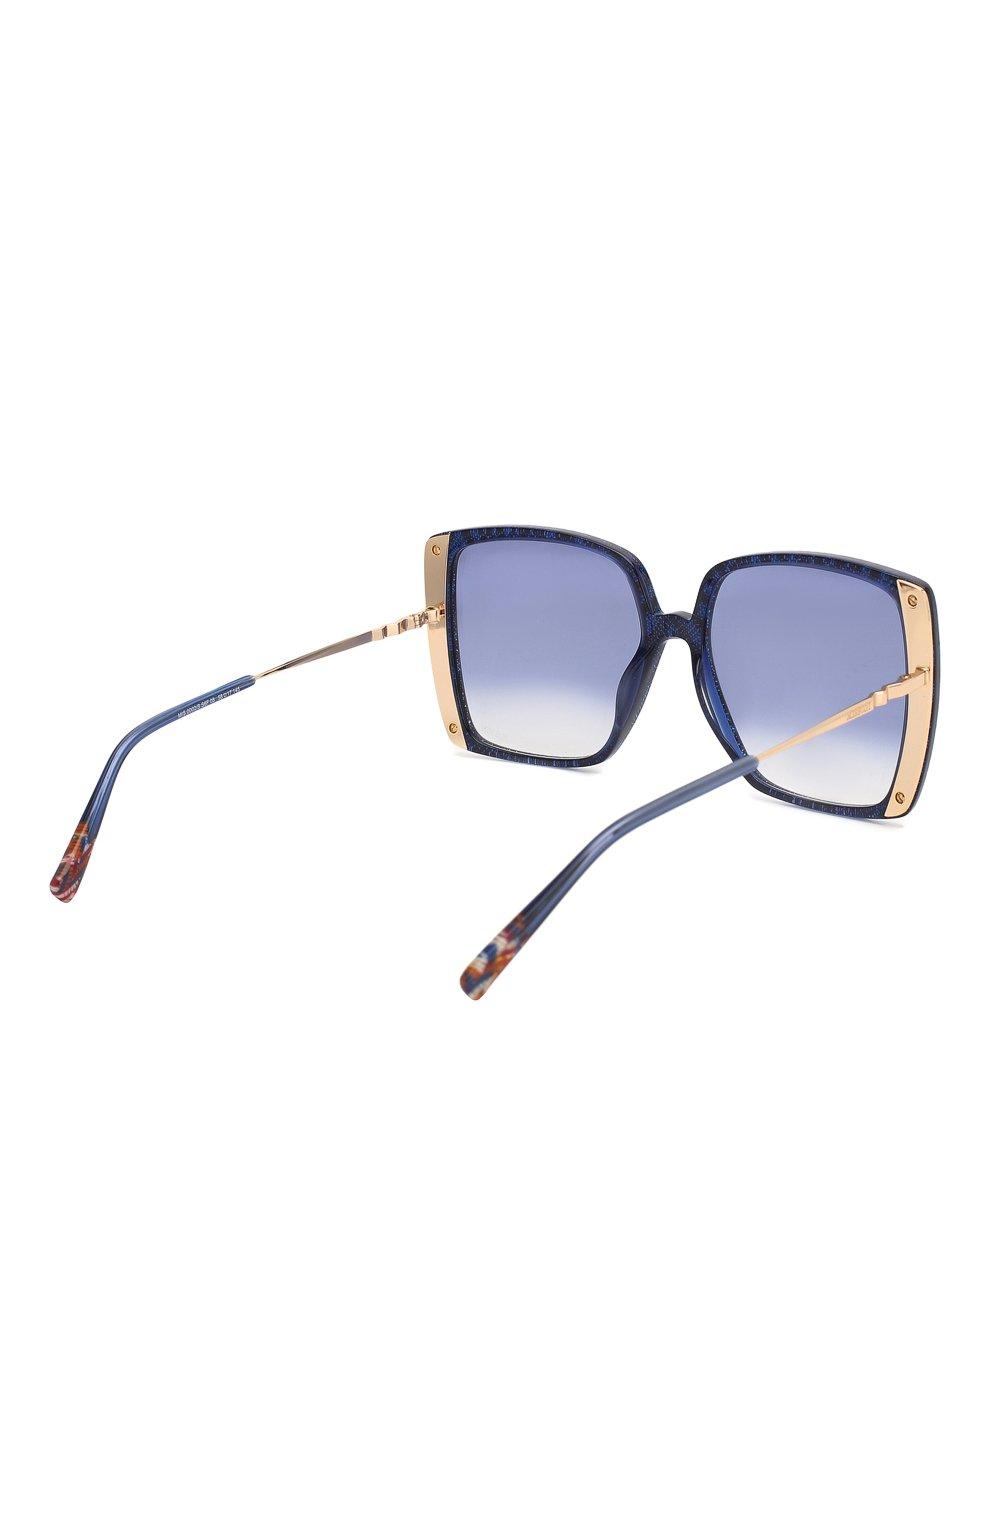 Женские солнцезащитные очки MISSONI синего цвета, арт. MIS0002 S6F | Фото 4